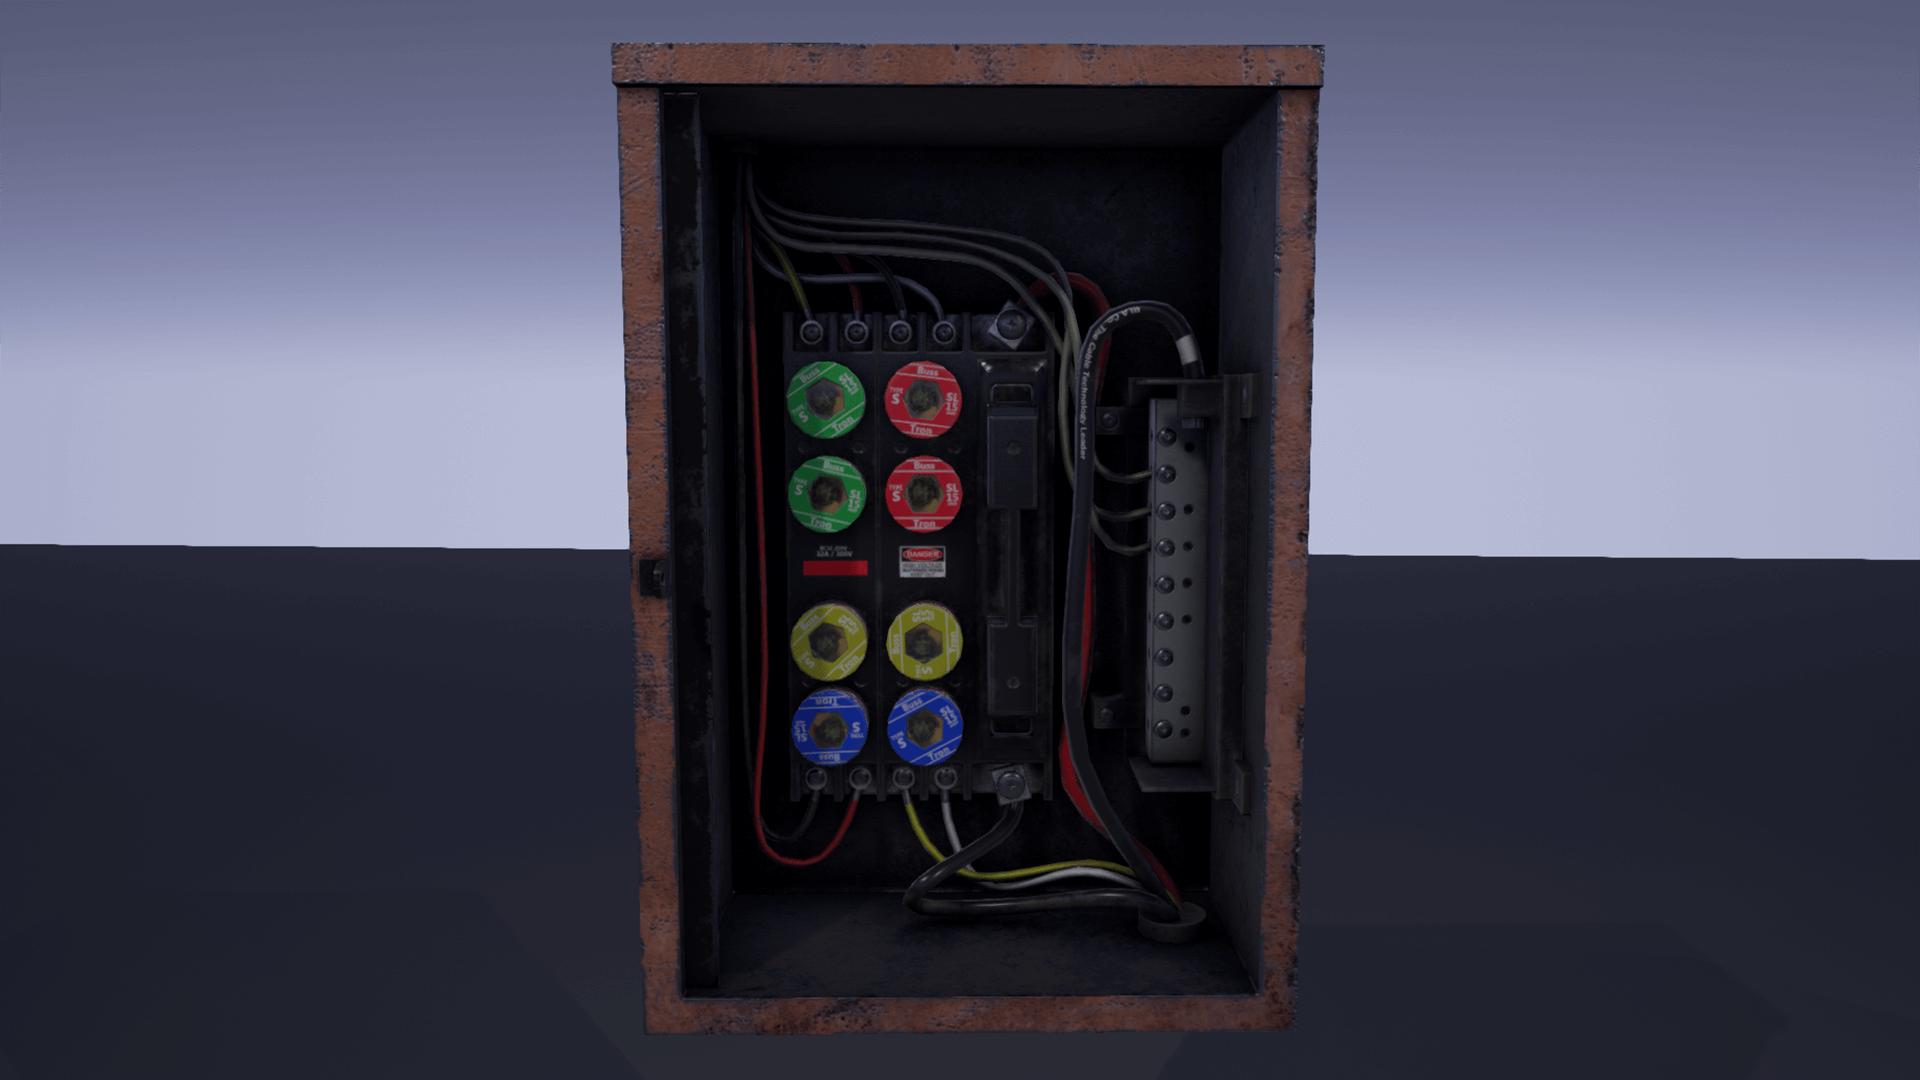 1920 Fuse Box -Fuse Box Diagram For 2002 745i | Begeboy Wiring Diagram  SourceBegeboy Wiring Diagram Source